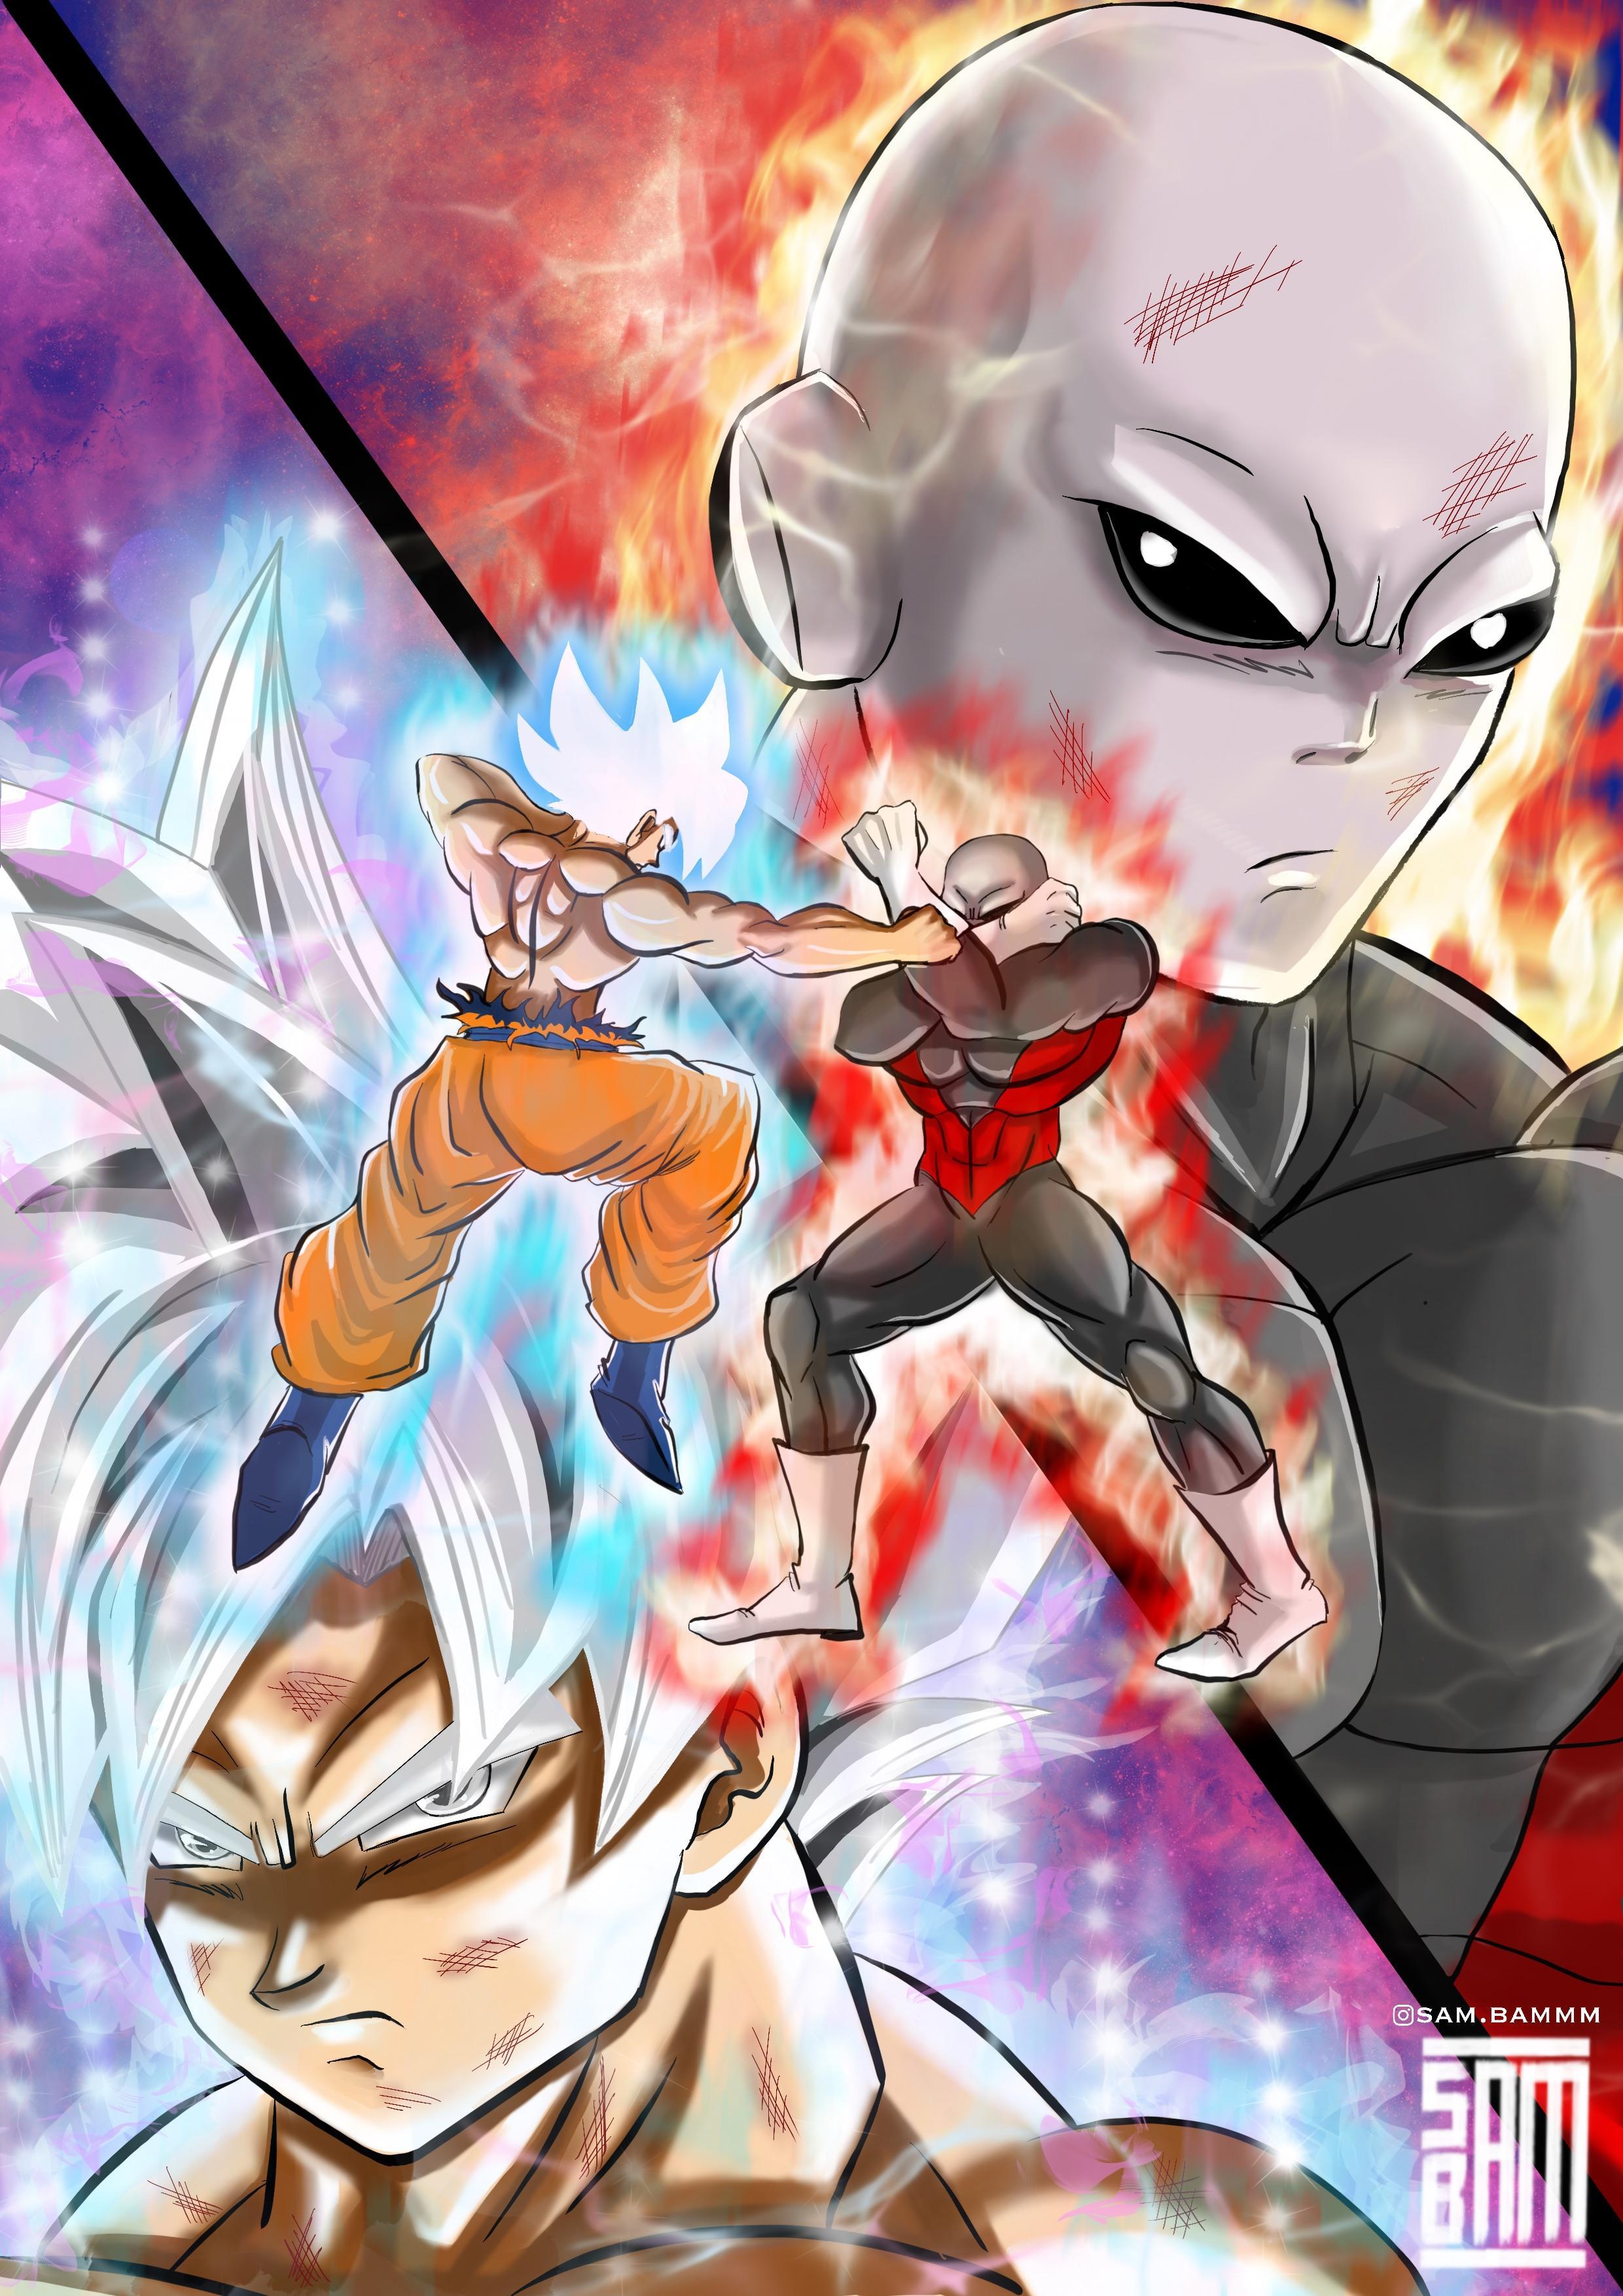 Dragon Ball Super Live Wallpaper Iphone X Goku Mastered Ultra Instinct Vs Jiren Fanart